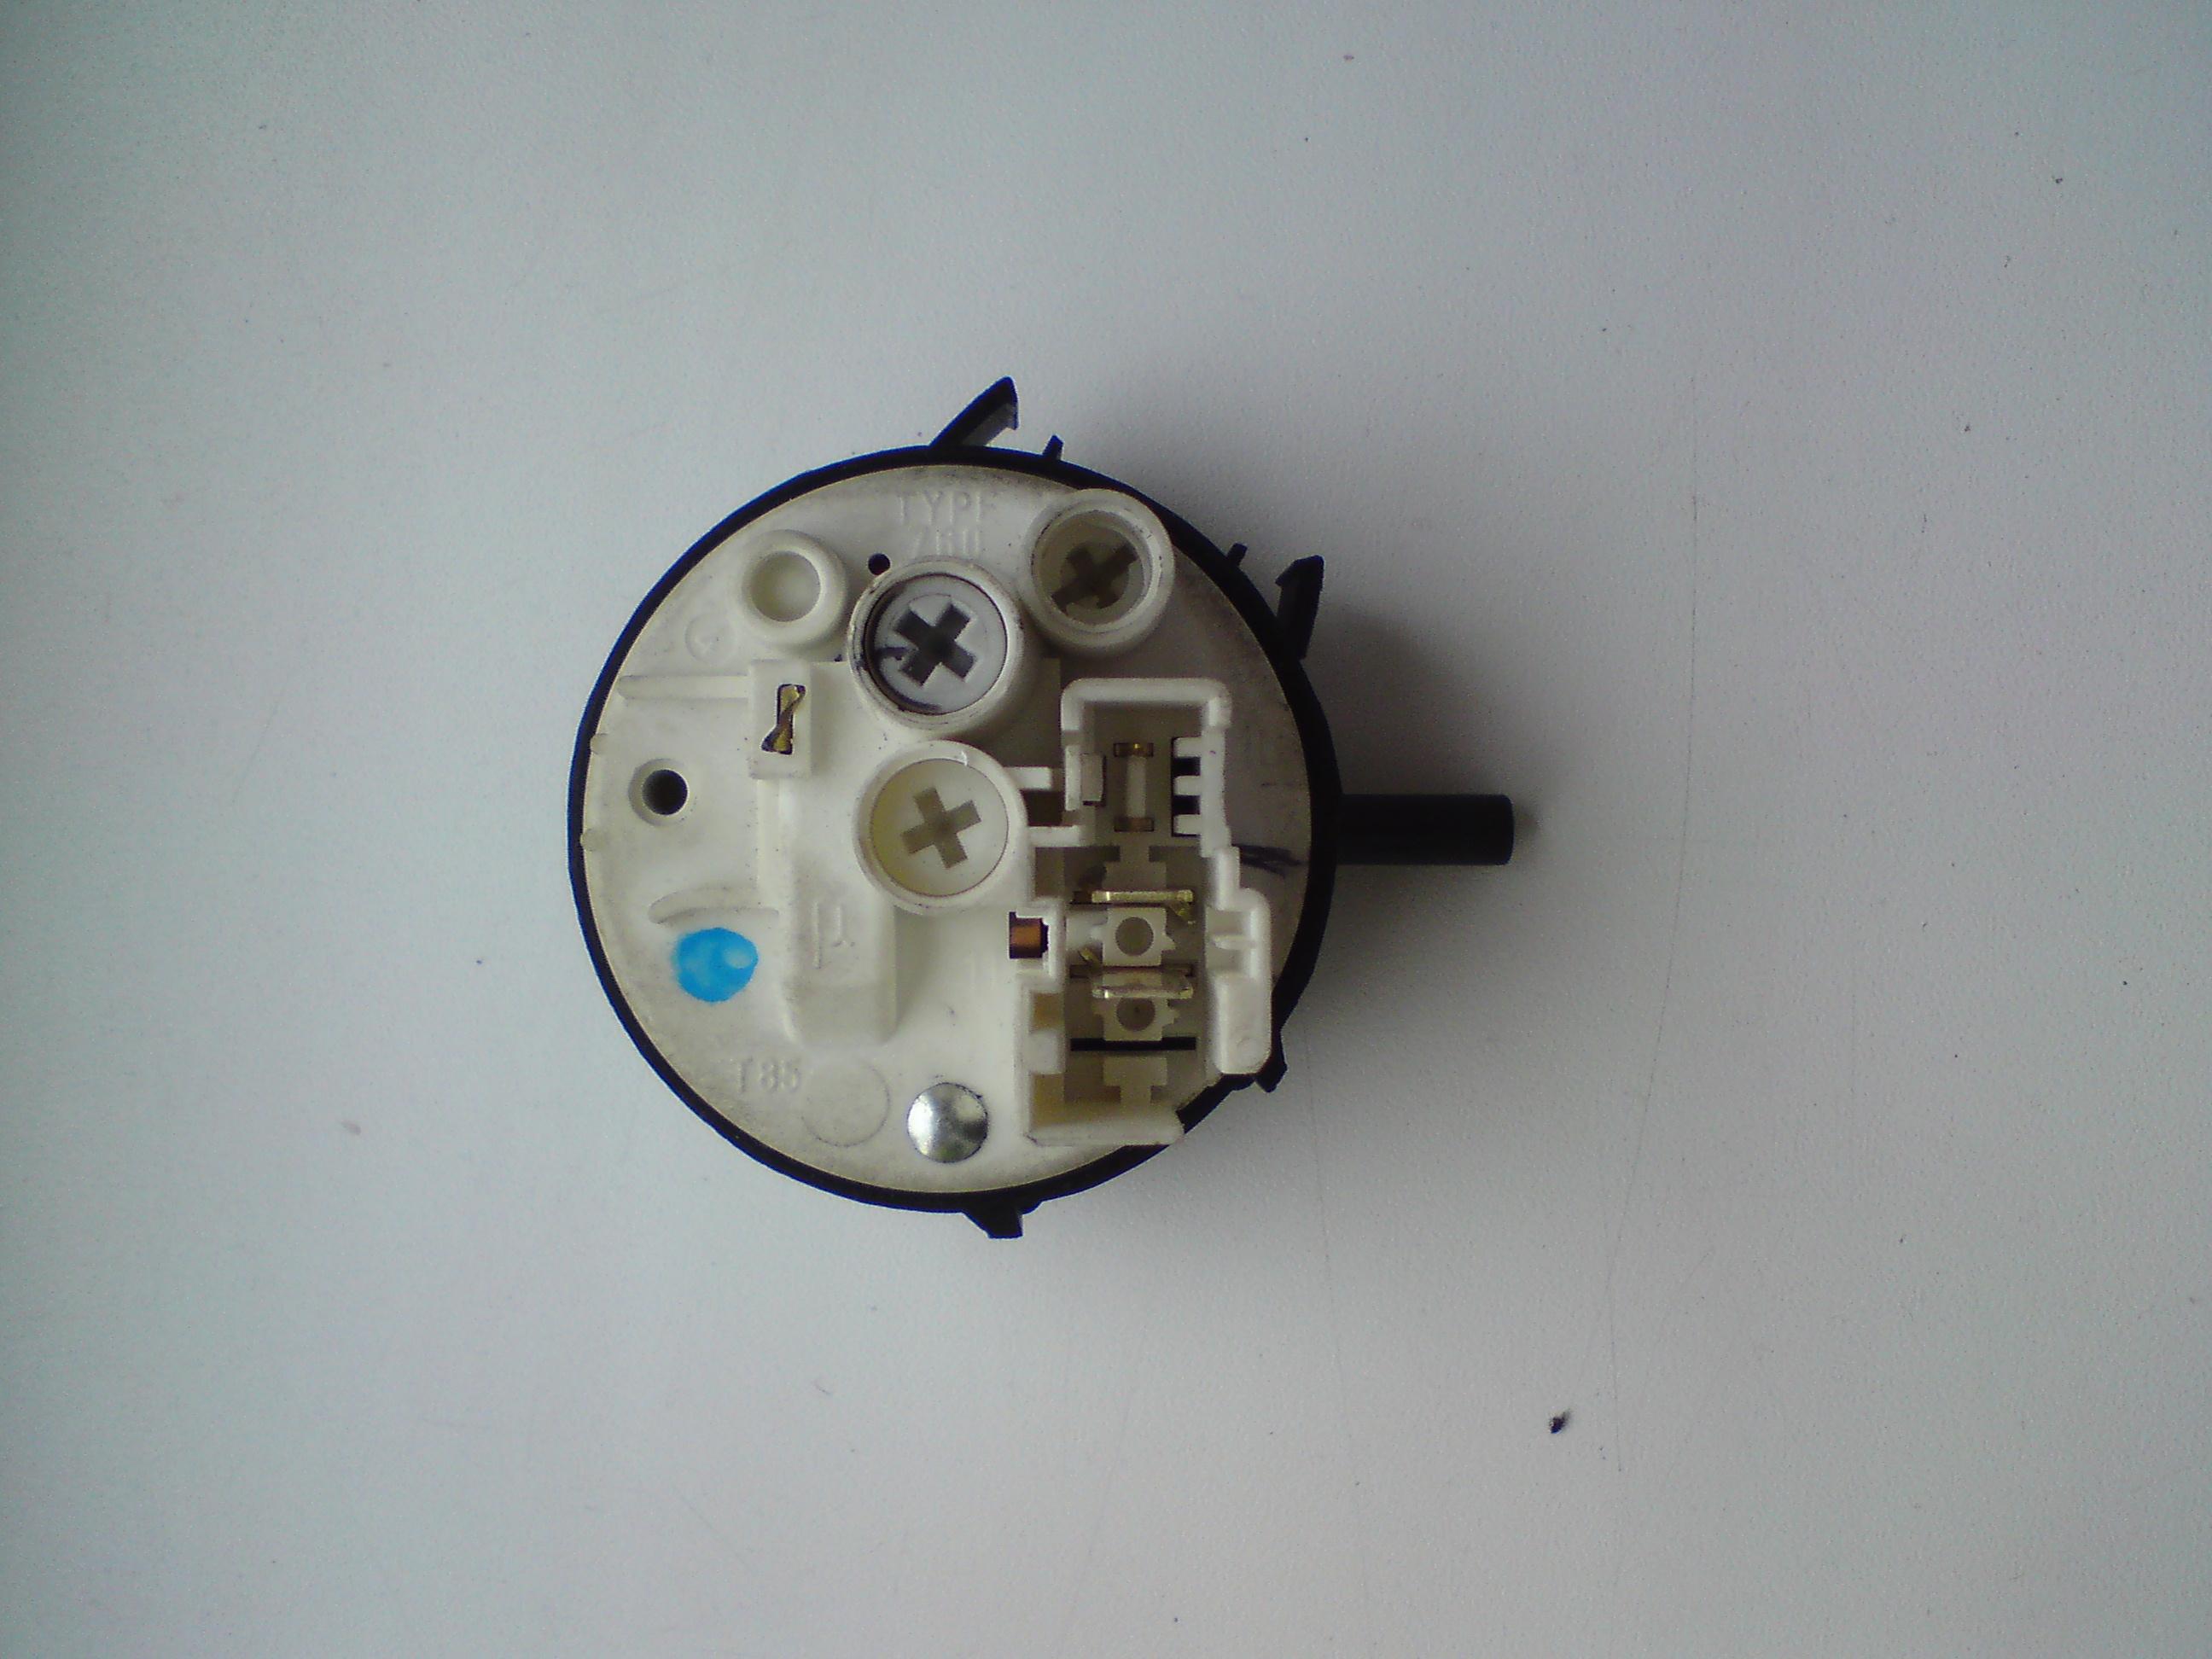 Cudowna Polar ptl 1000 kody błędów - elektroda.pl UX29